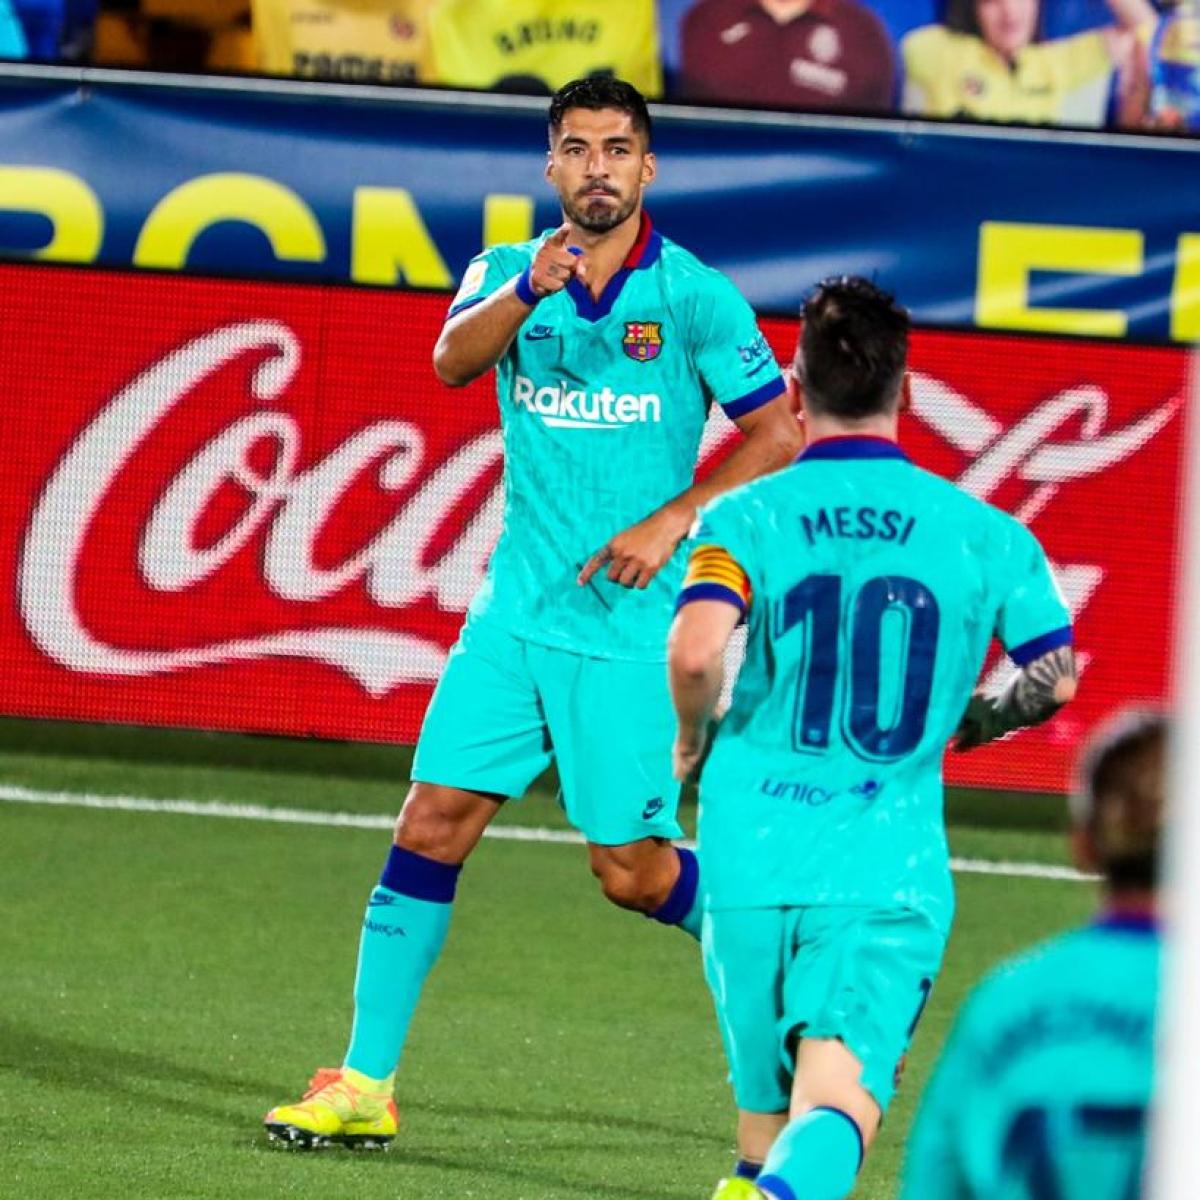 La Liga highlights: Luis Suarez becomes Barcelona's third-highest goalscorer after scoring in 4-1 victory against Villarreal